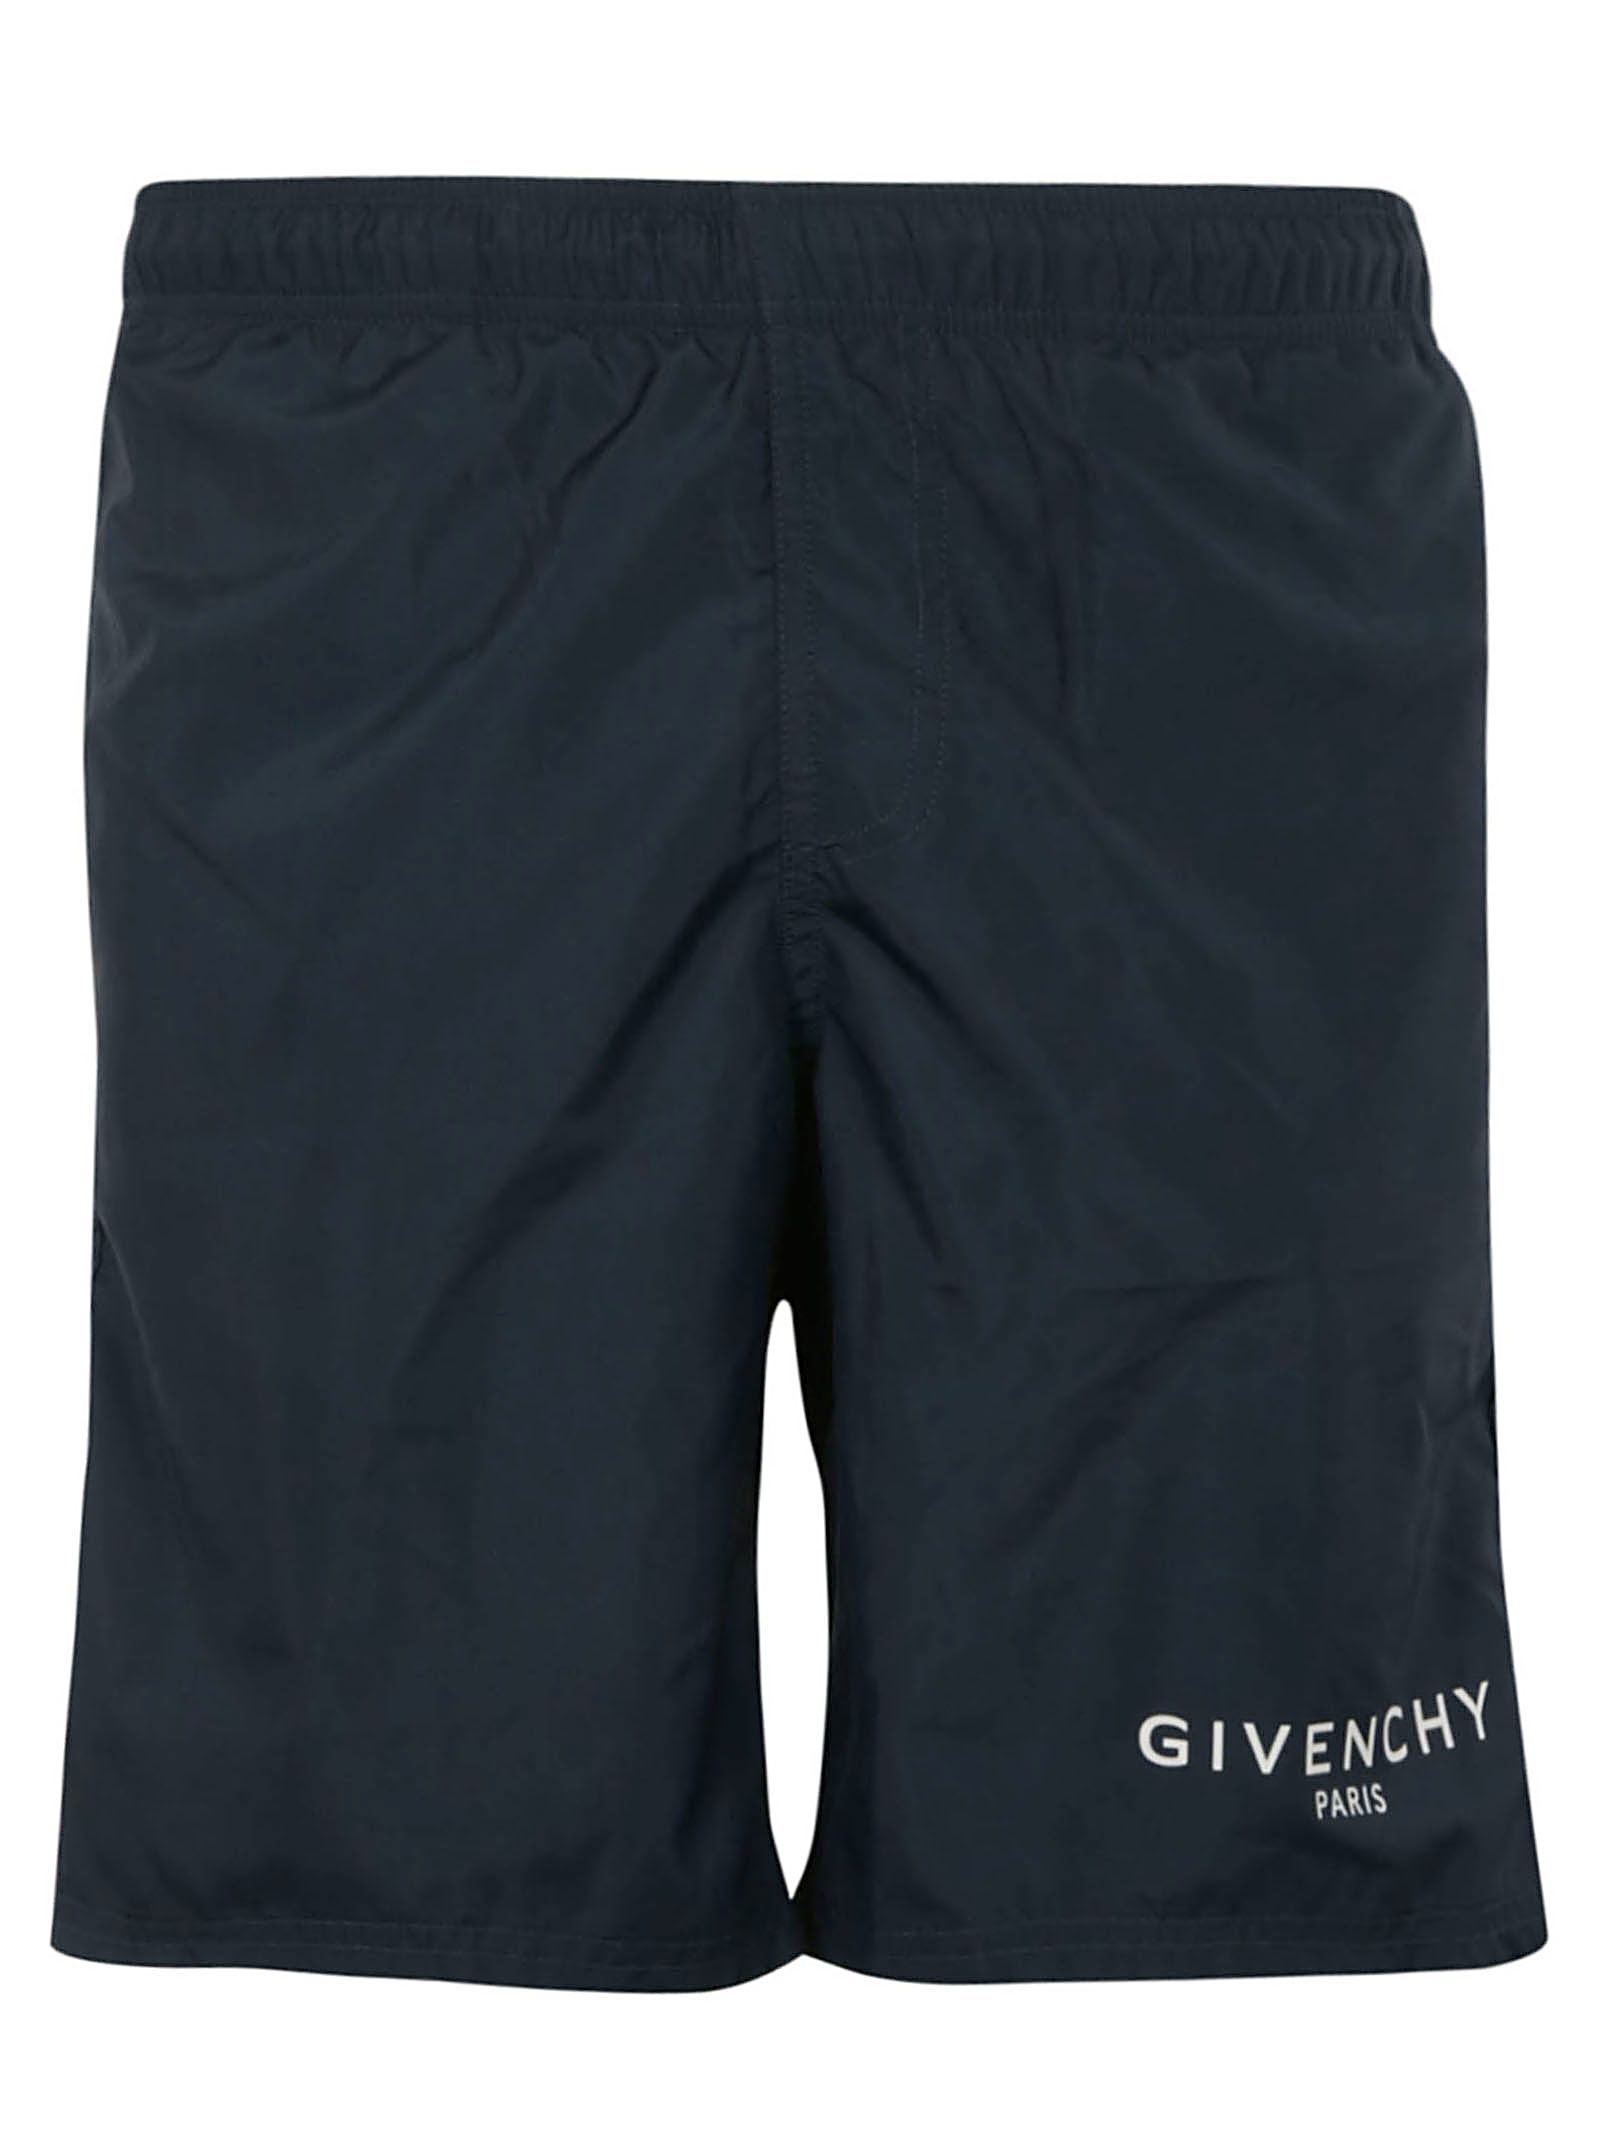 a2af22ee41e568 GIVENCHY LOGO SWIM SHORTS.  givenchy  cloth